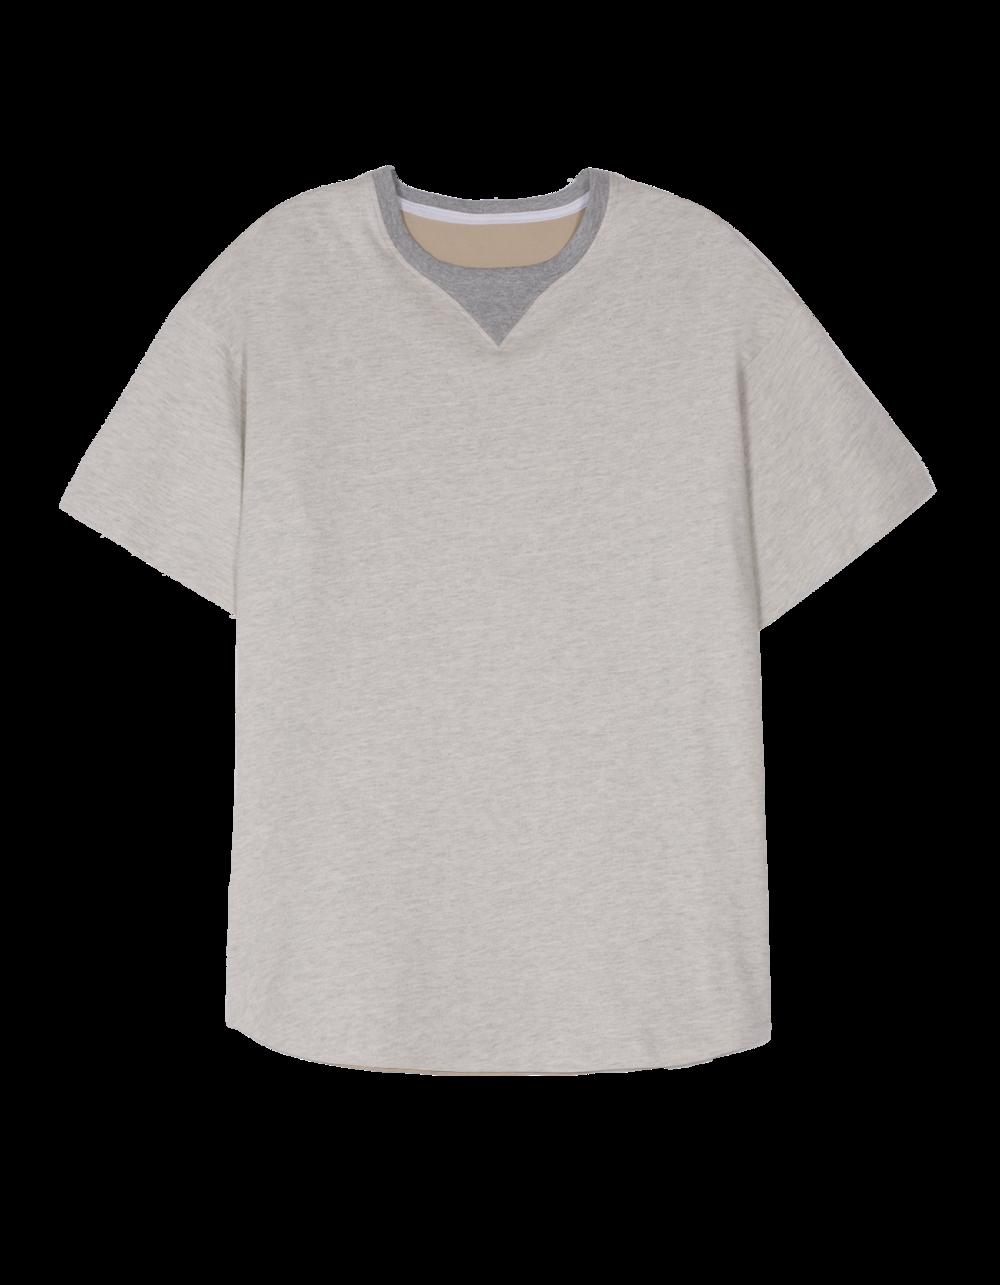 camiseta4.png